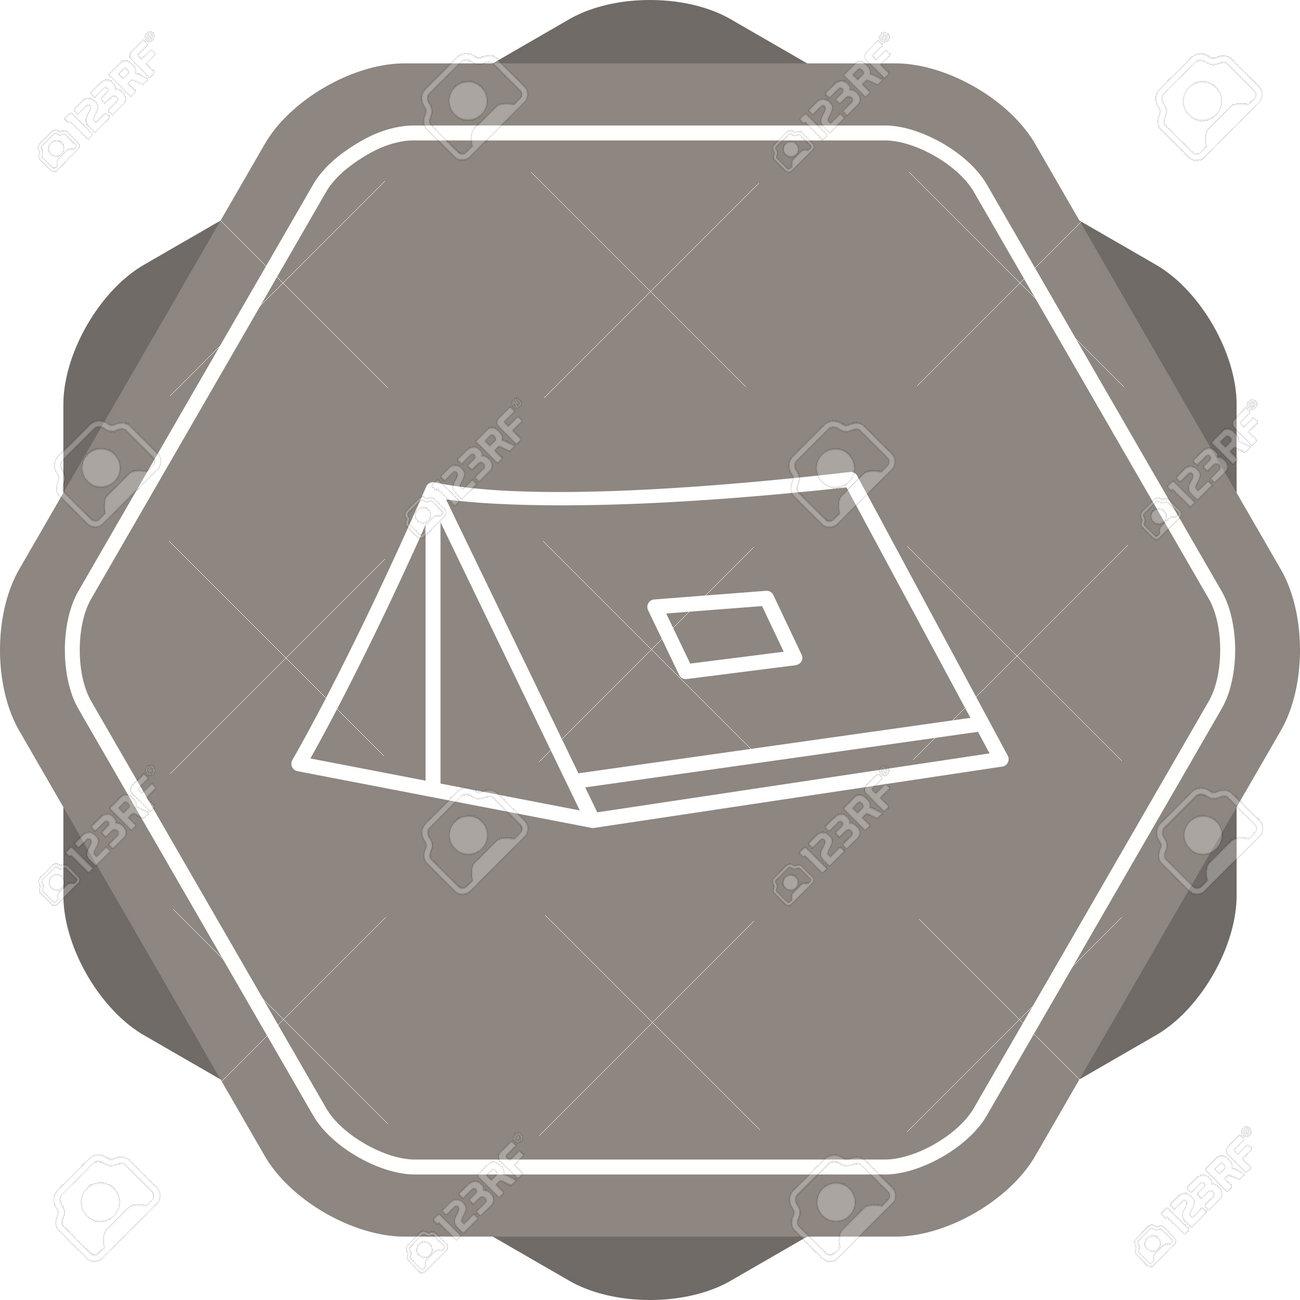 Unique Tent Line Vector Icon - 167962523